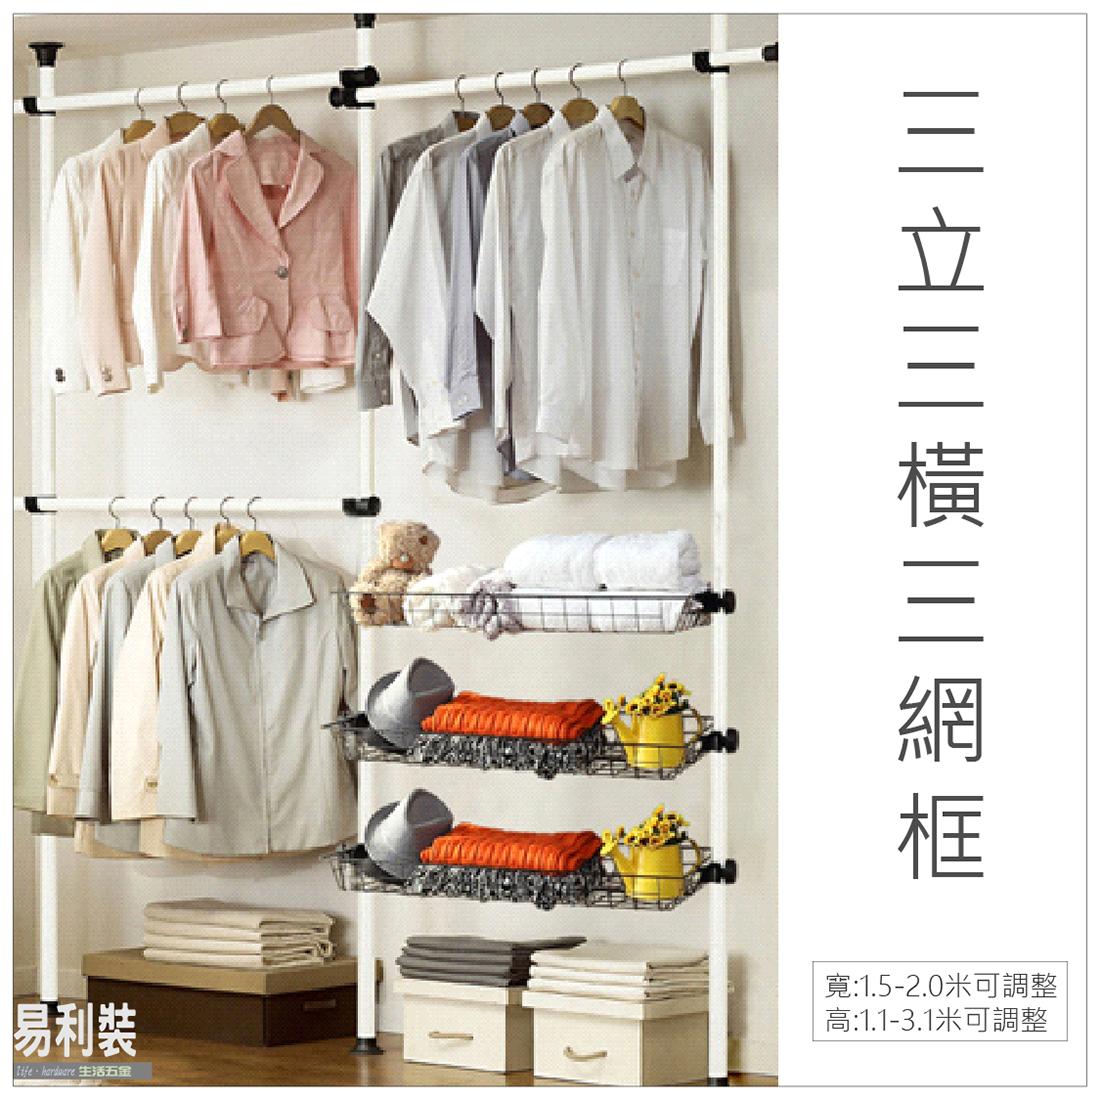 【 EASYCAN  】ECR013 頂天立地組合 易利裝生活五金 房間 臥房 衣櫃 小資族 辦公家具 系統家具